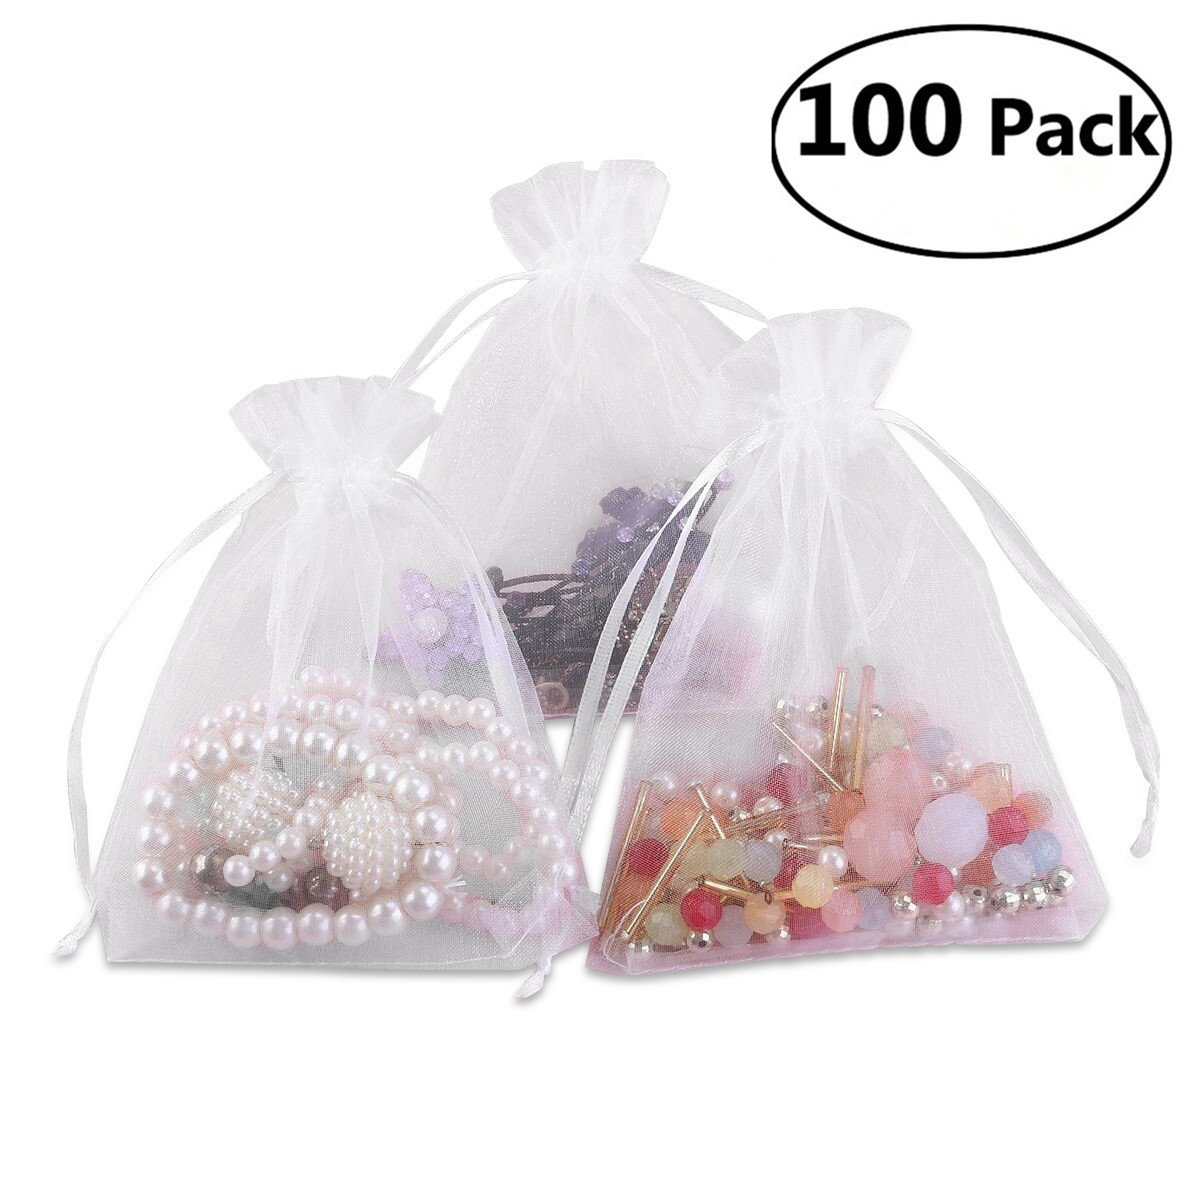 Foxnovo 100 Pack 9x12cm Organza Drawstring Gift Bags, Wedding Favor Bags (White)